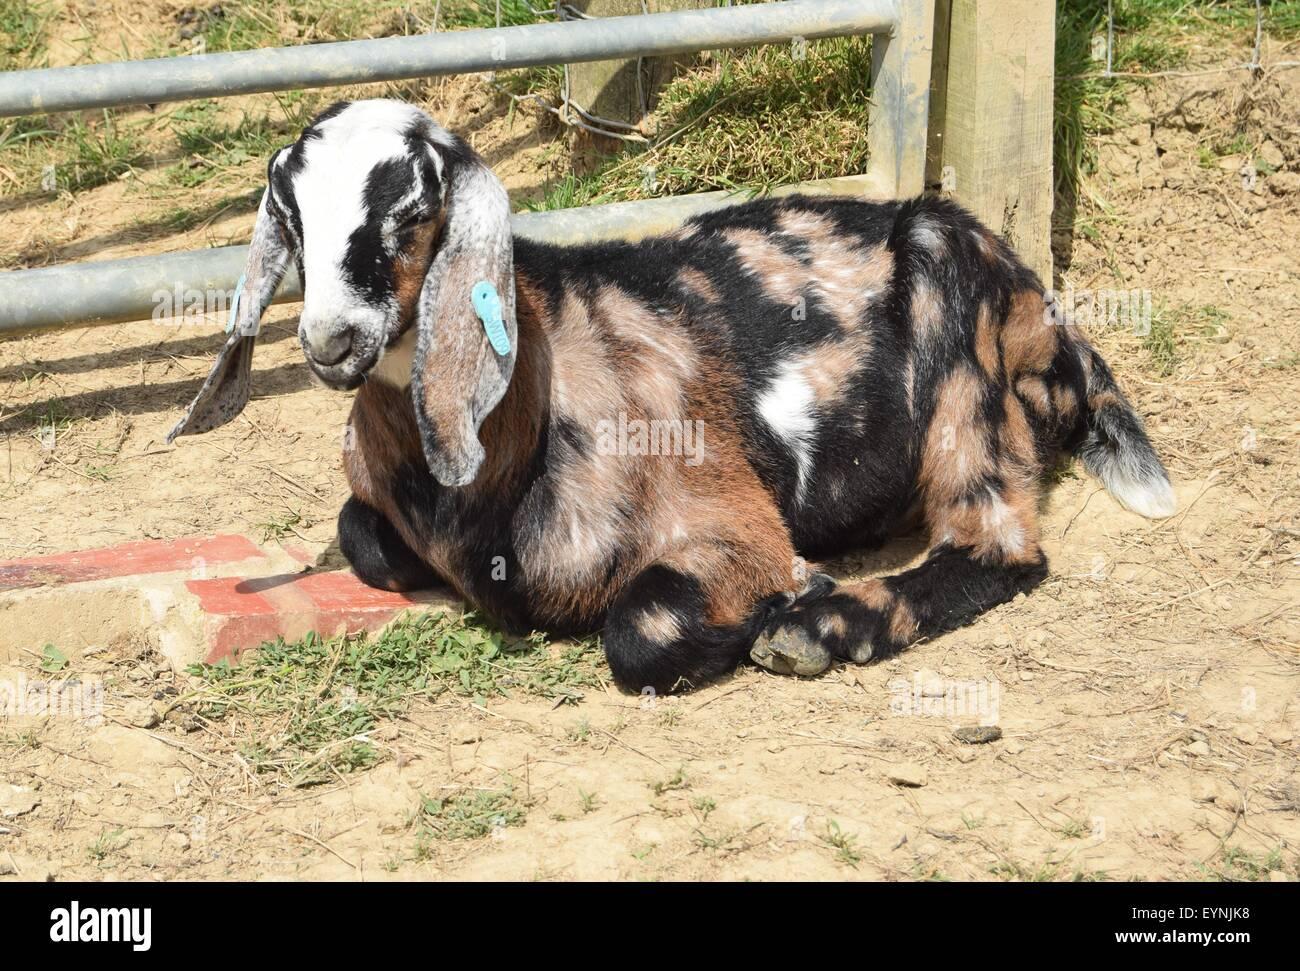 Our six week old pedigree Anglo Nubian goat buck kid sunbathing. Spotty goats - Stock Image